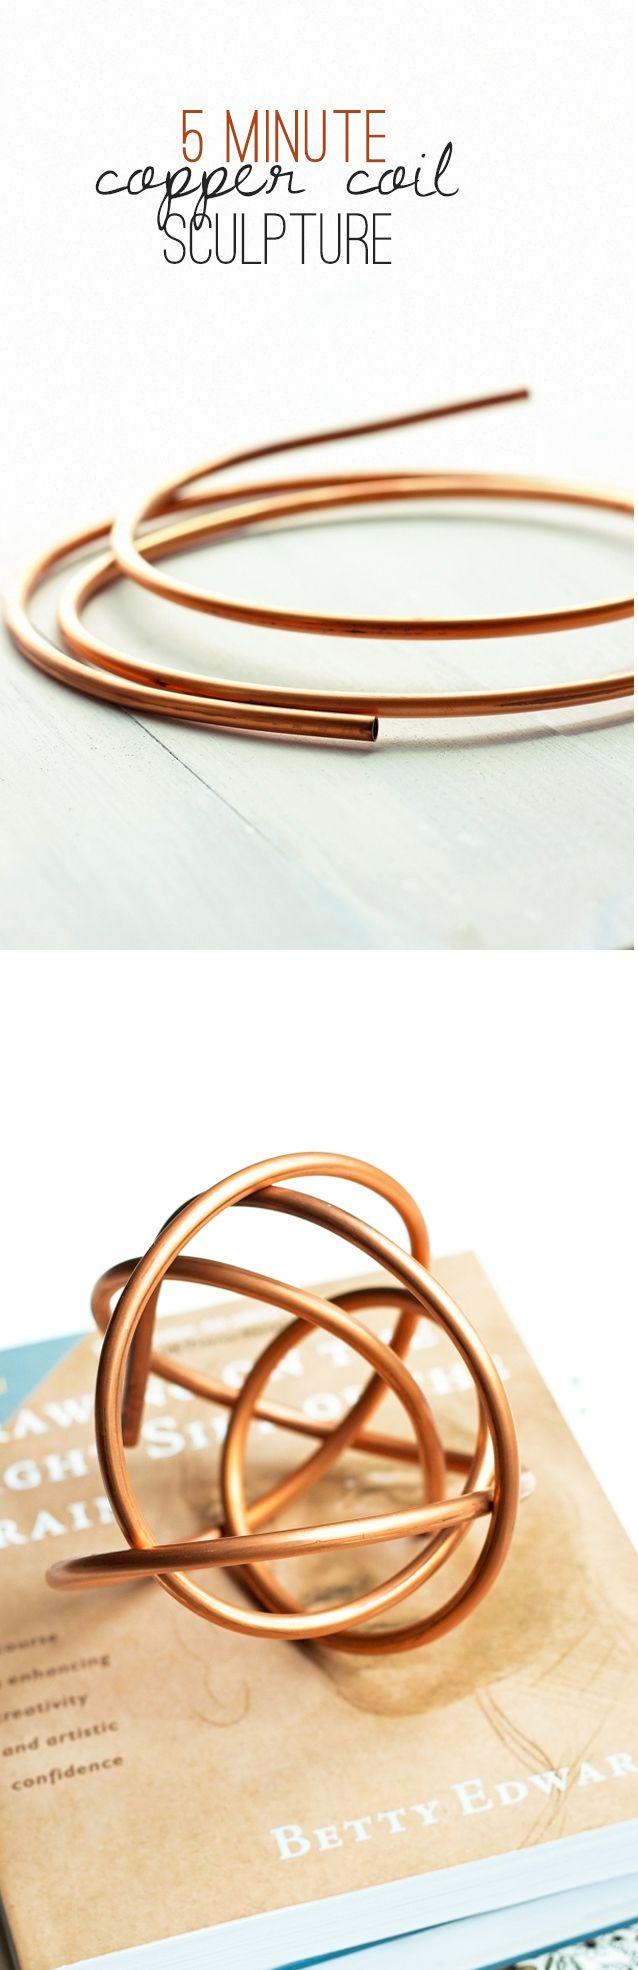 Five Minute Copper Coil Sculpture Tutorial  PIN now!   READ more at www.penniesforafortune.com